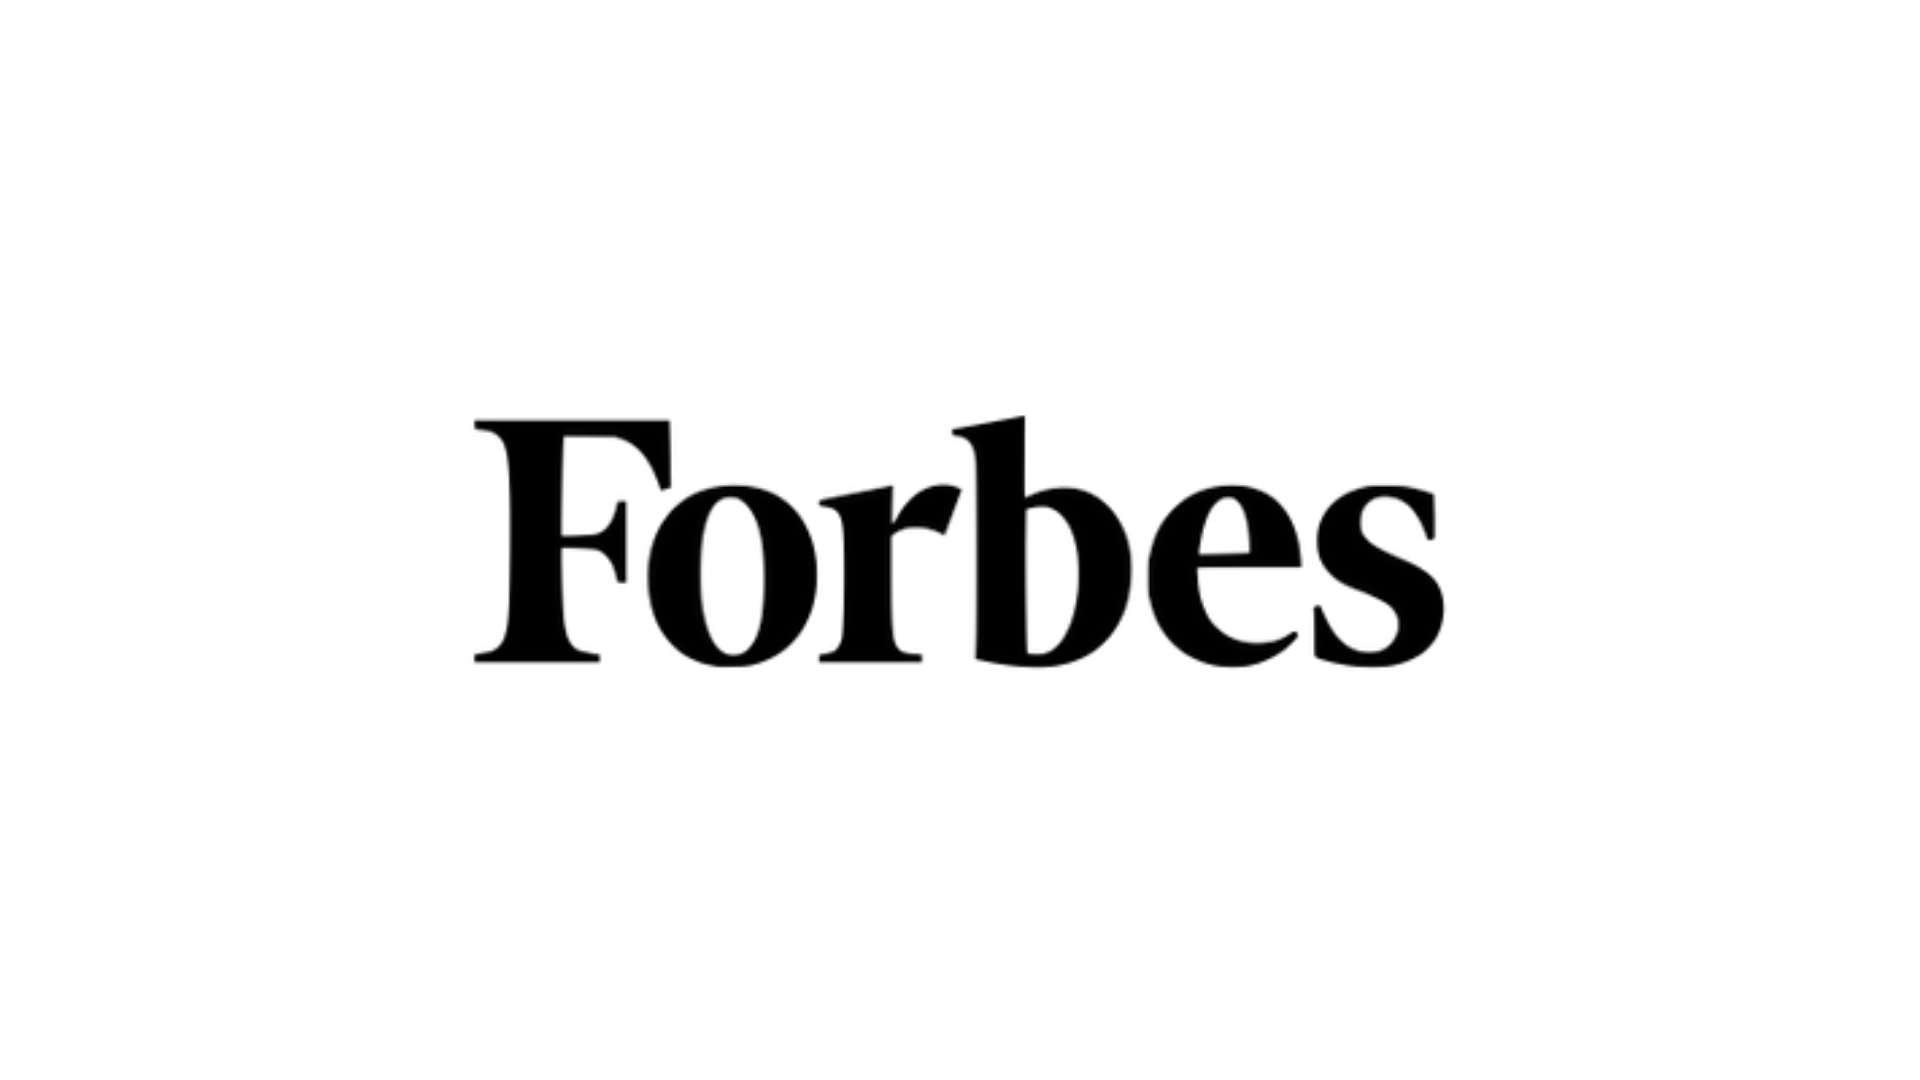 Forbes Chloe Capital